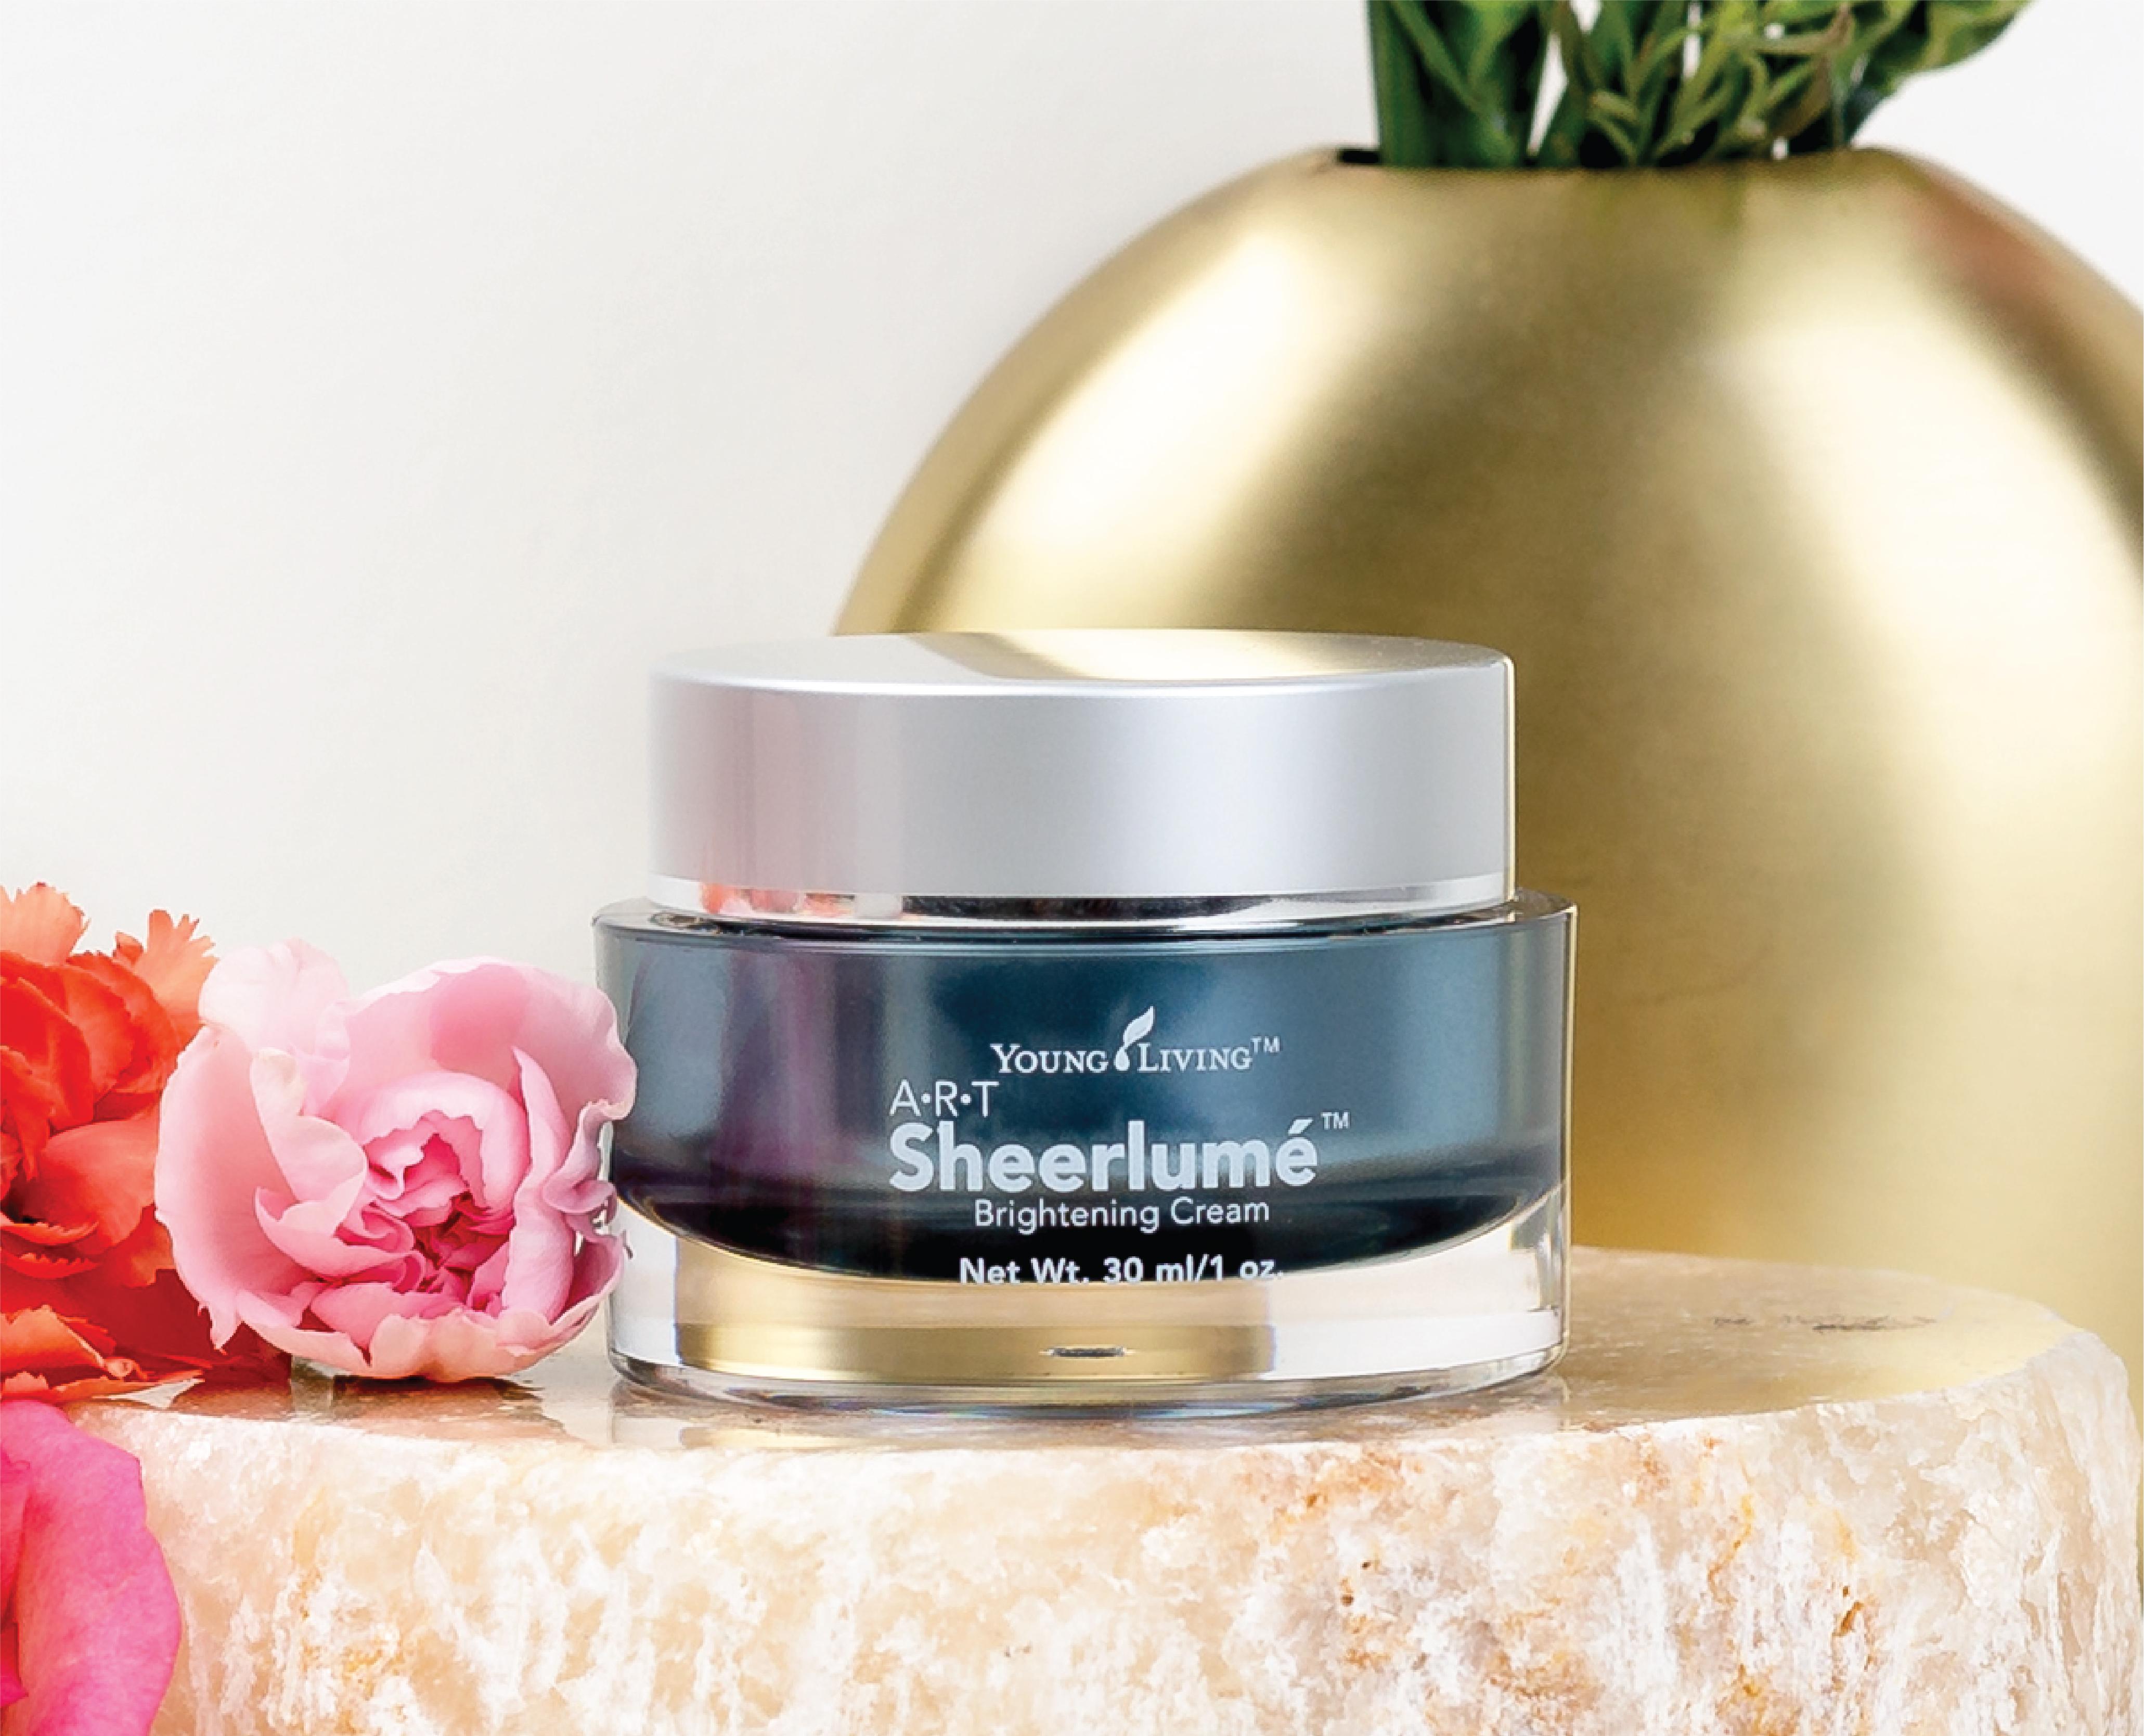 ART® Sheerlumé™ Brightening Cream